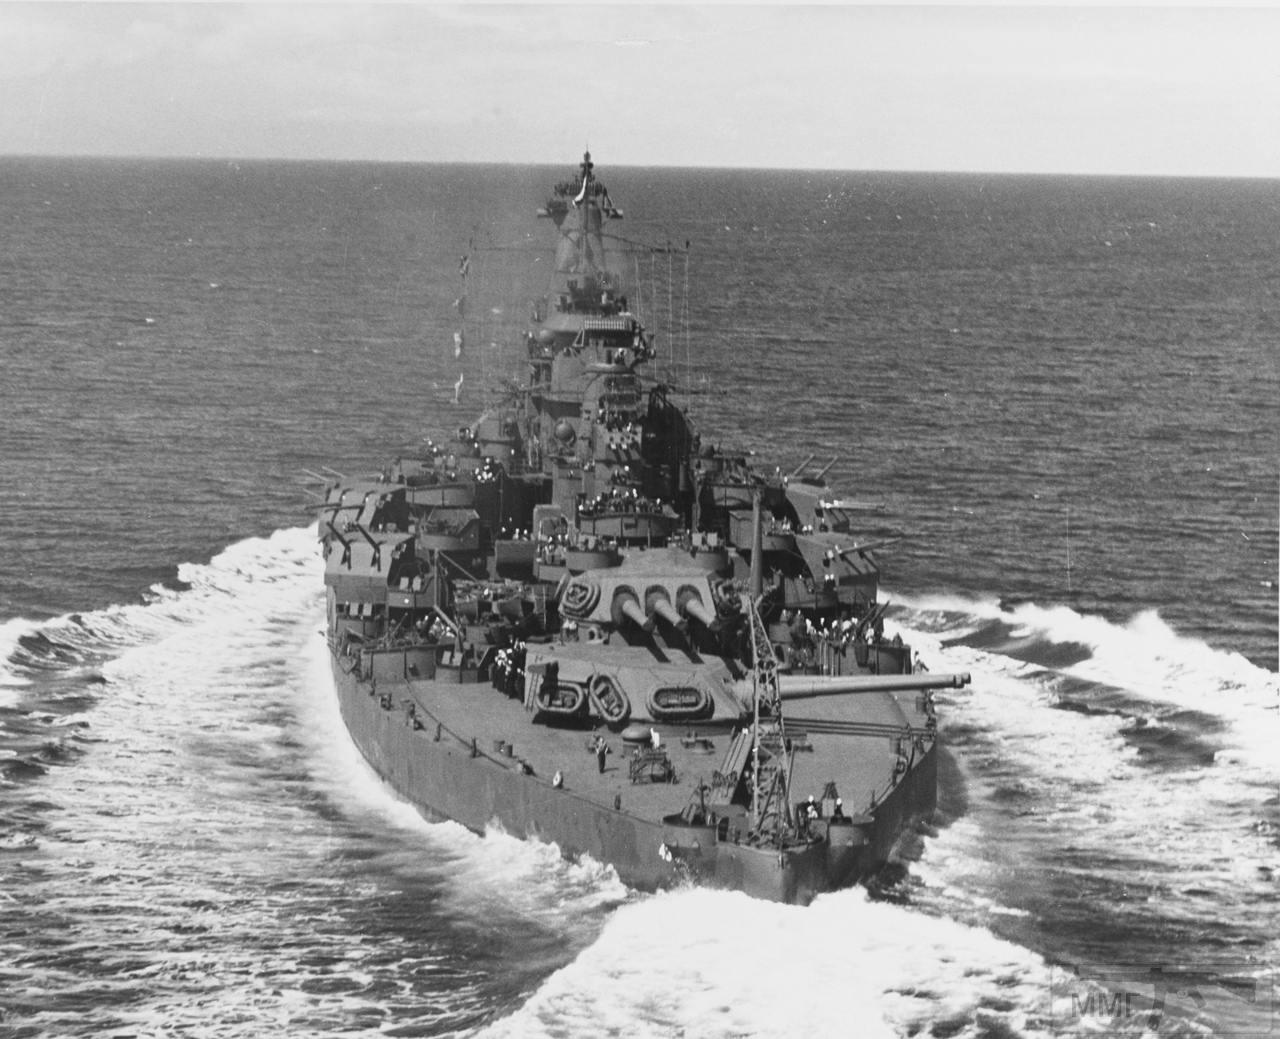 44487 - USS Tennessee (BB-43)